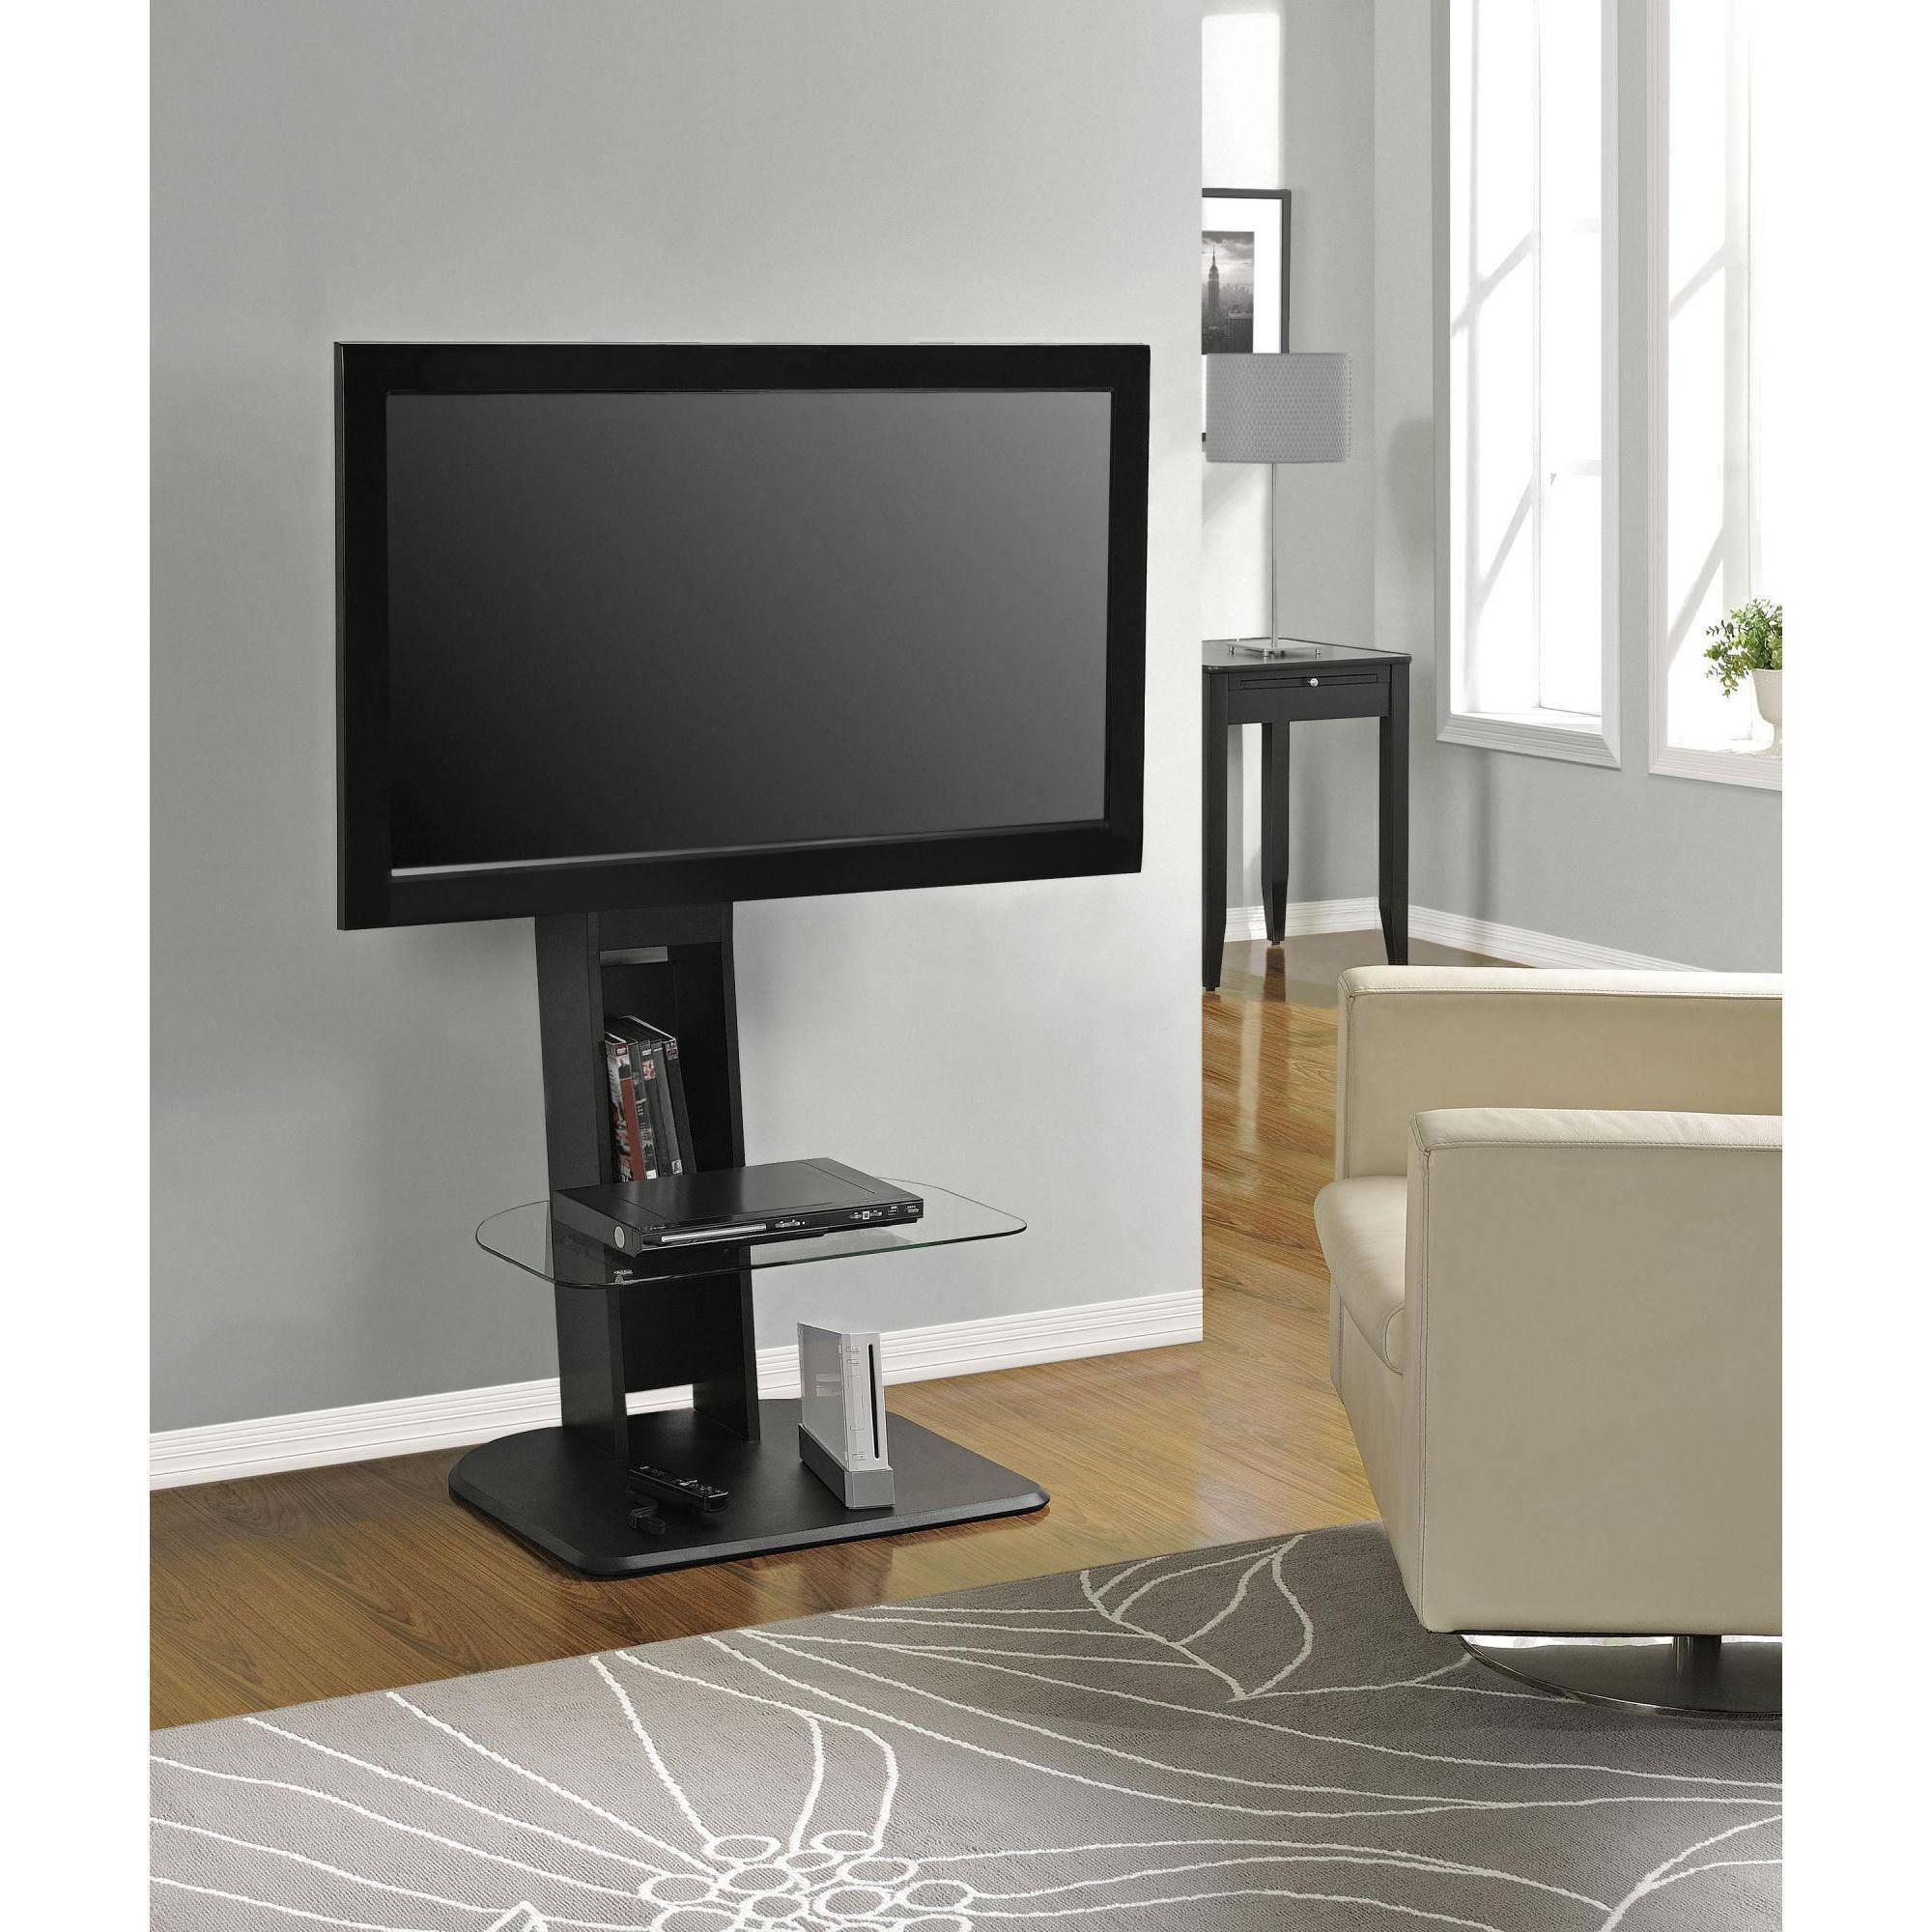 "Jaxx Black/grey Corner Tv Stand For Tvs Up To 40"" - Walmart intended for Black Wood Corner Tv Stands (Image 8 of 15)"